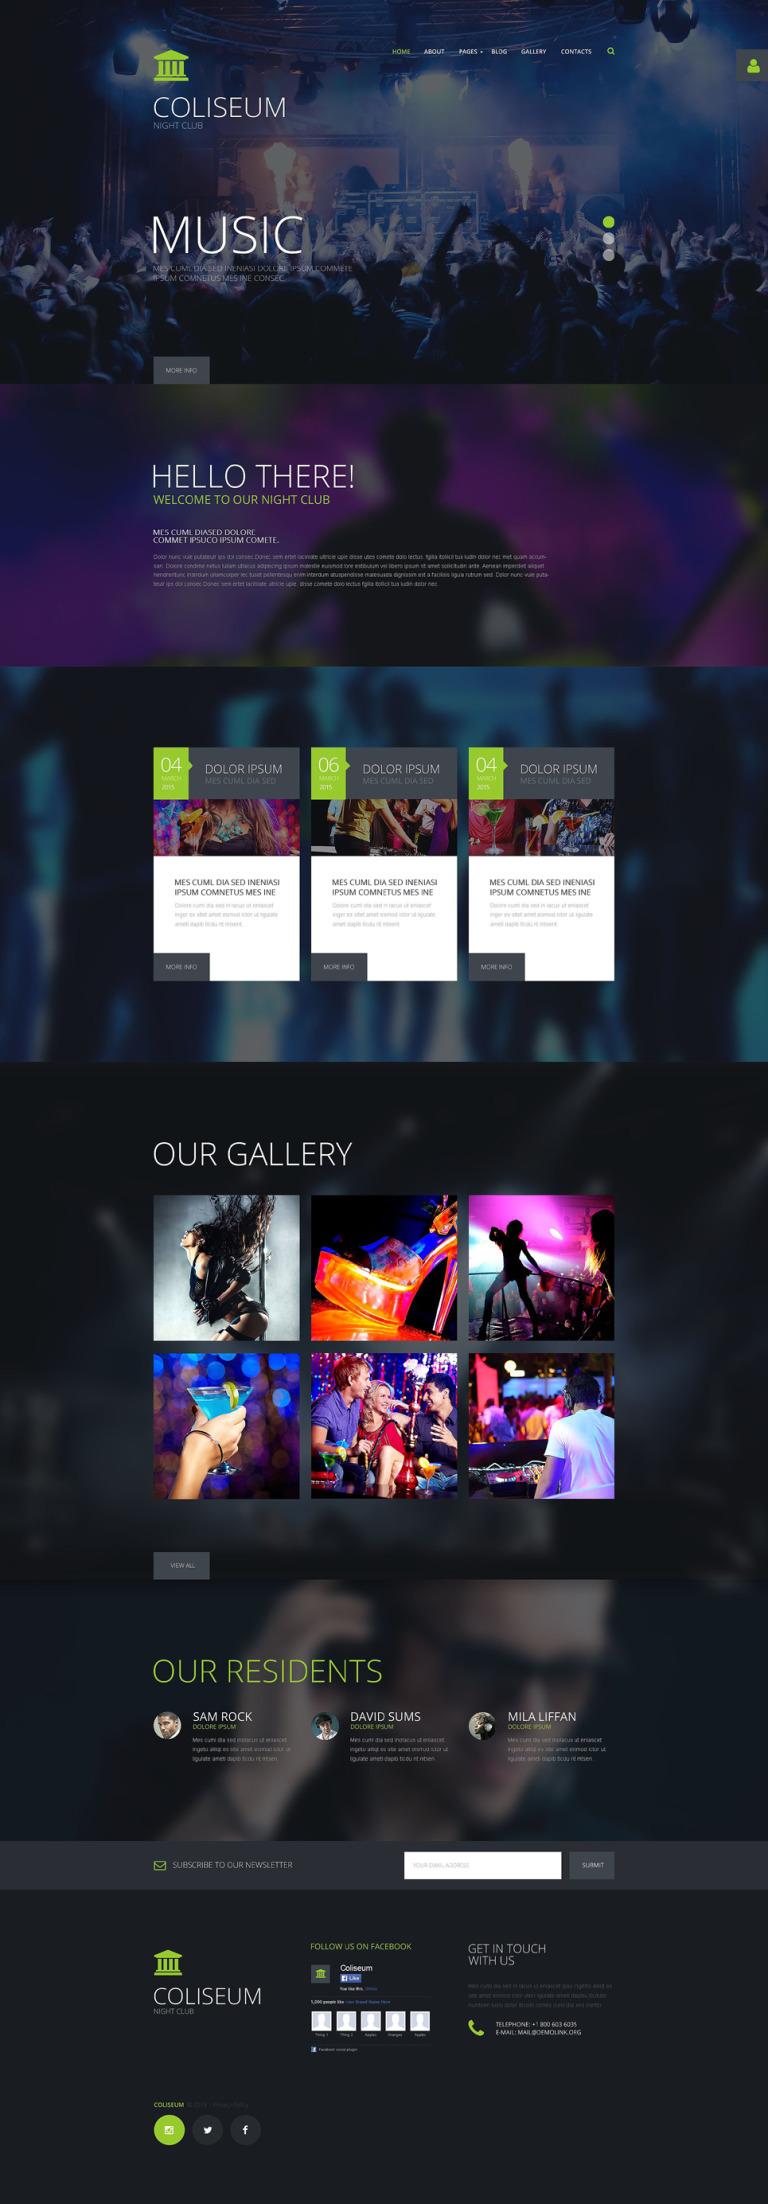 Coliseum Joomla Template New Screenshots BIG